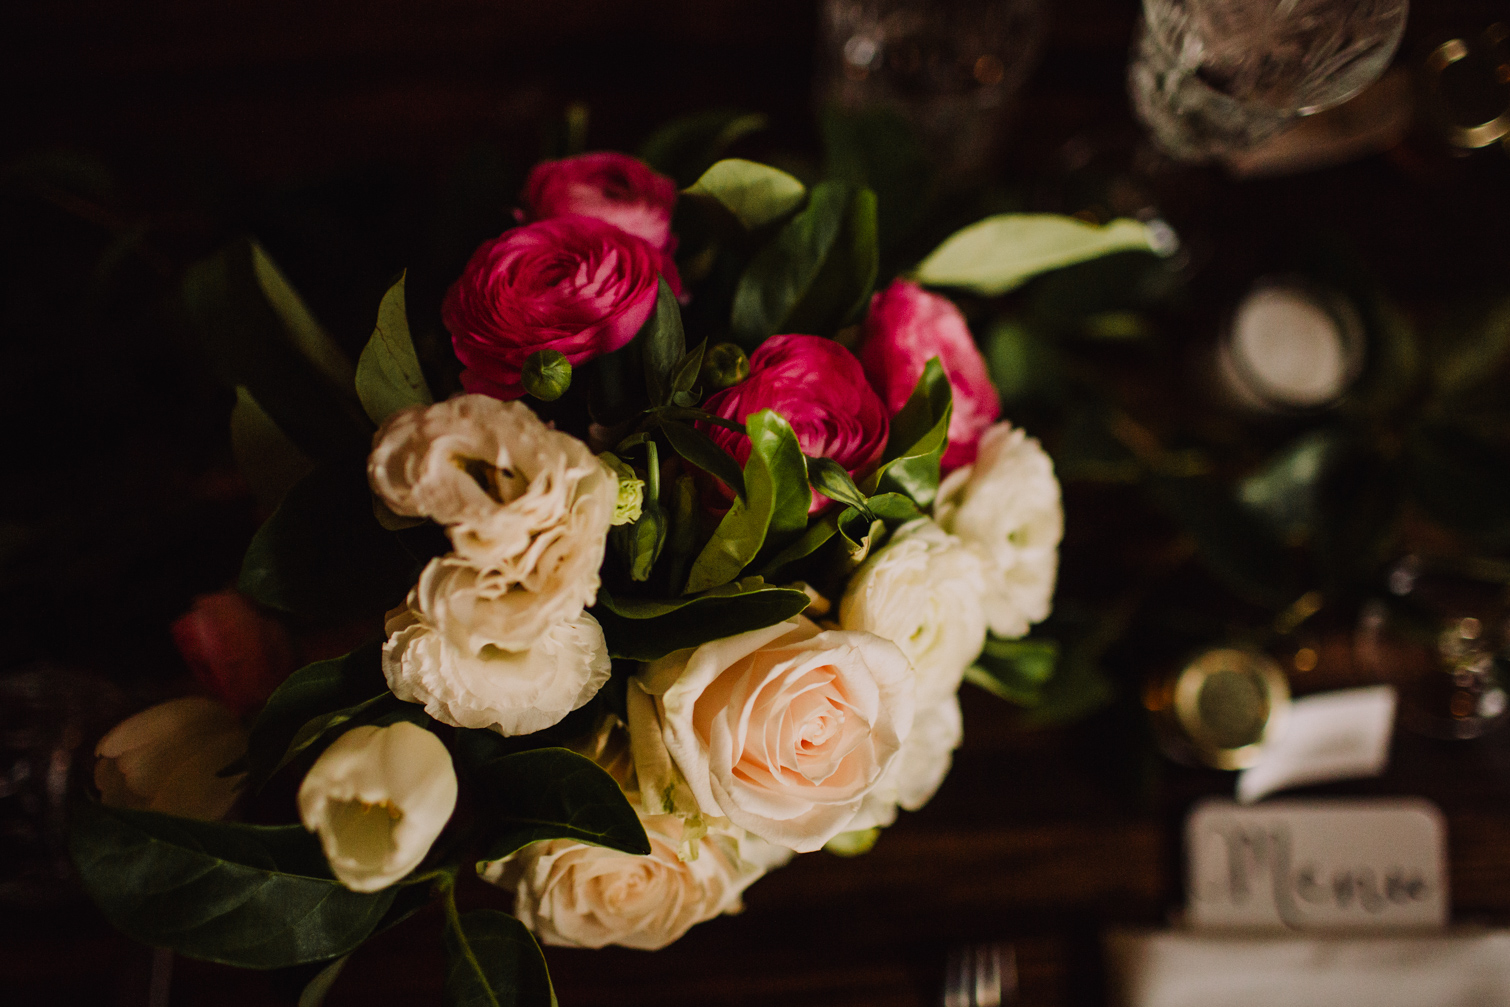 The_French_Petal_Wedding-Florist-11.jpg